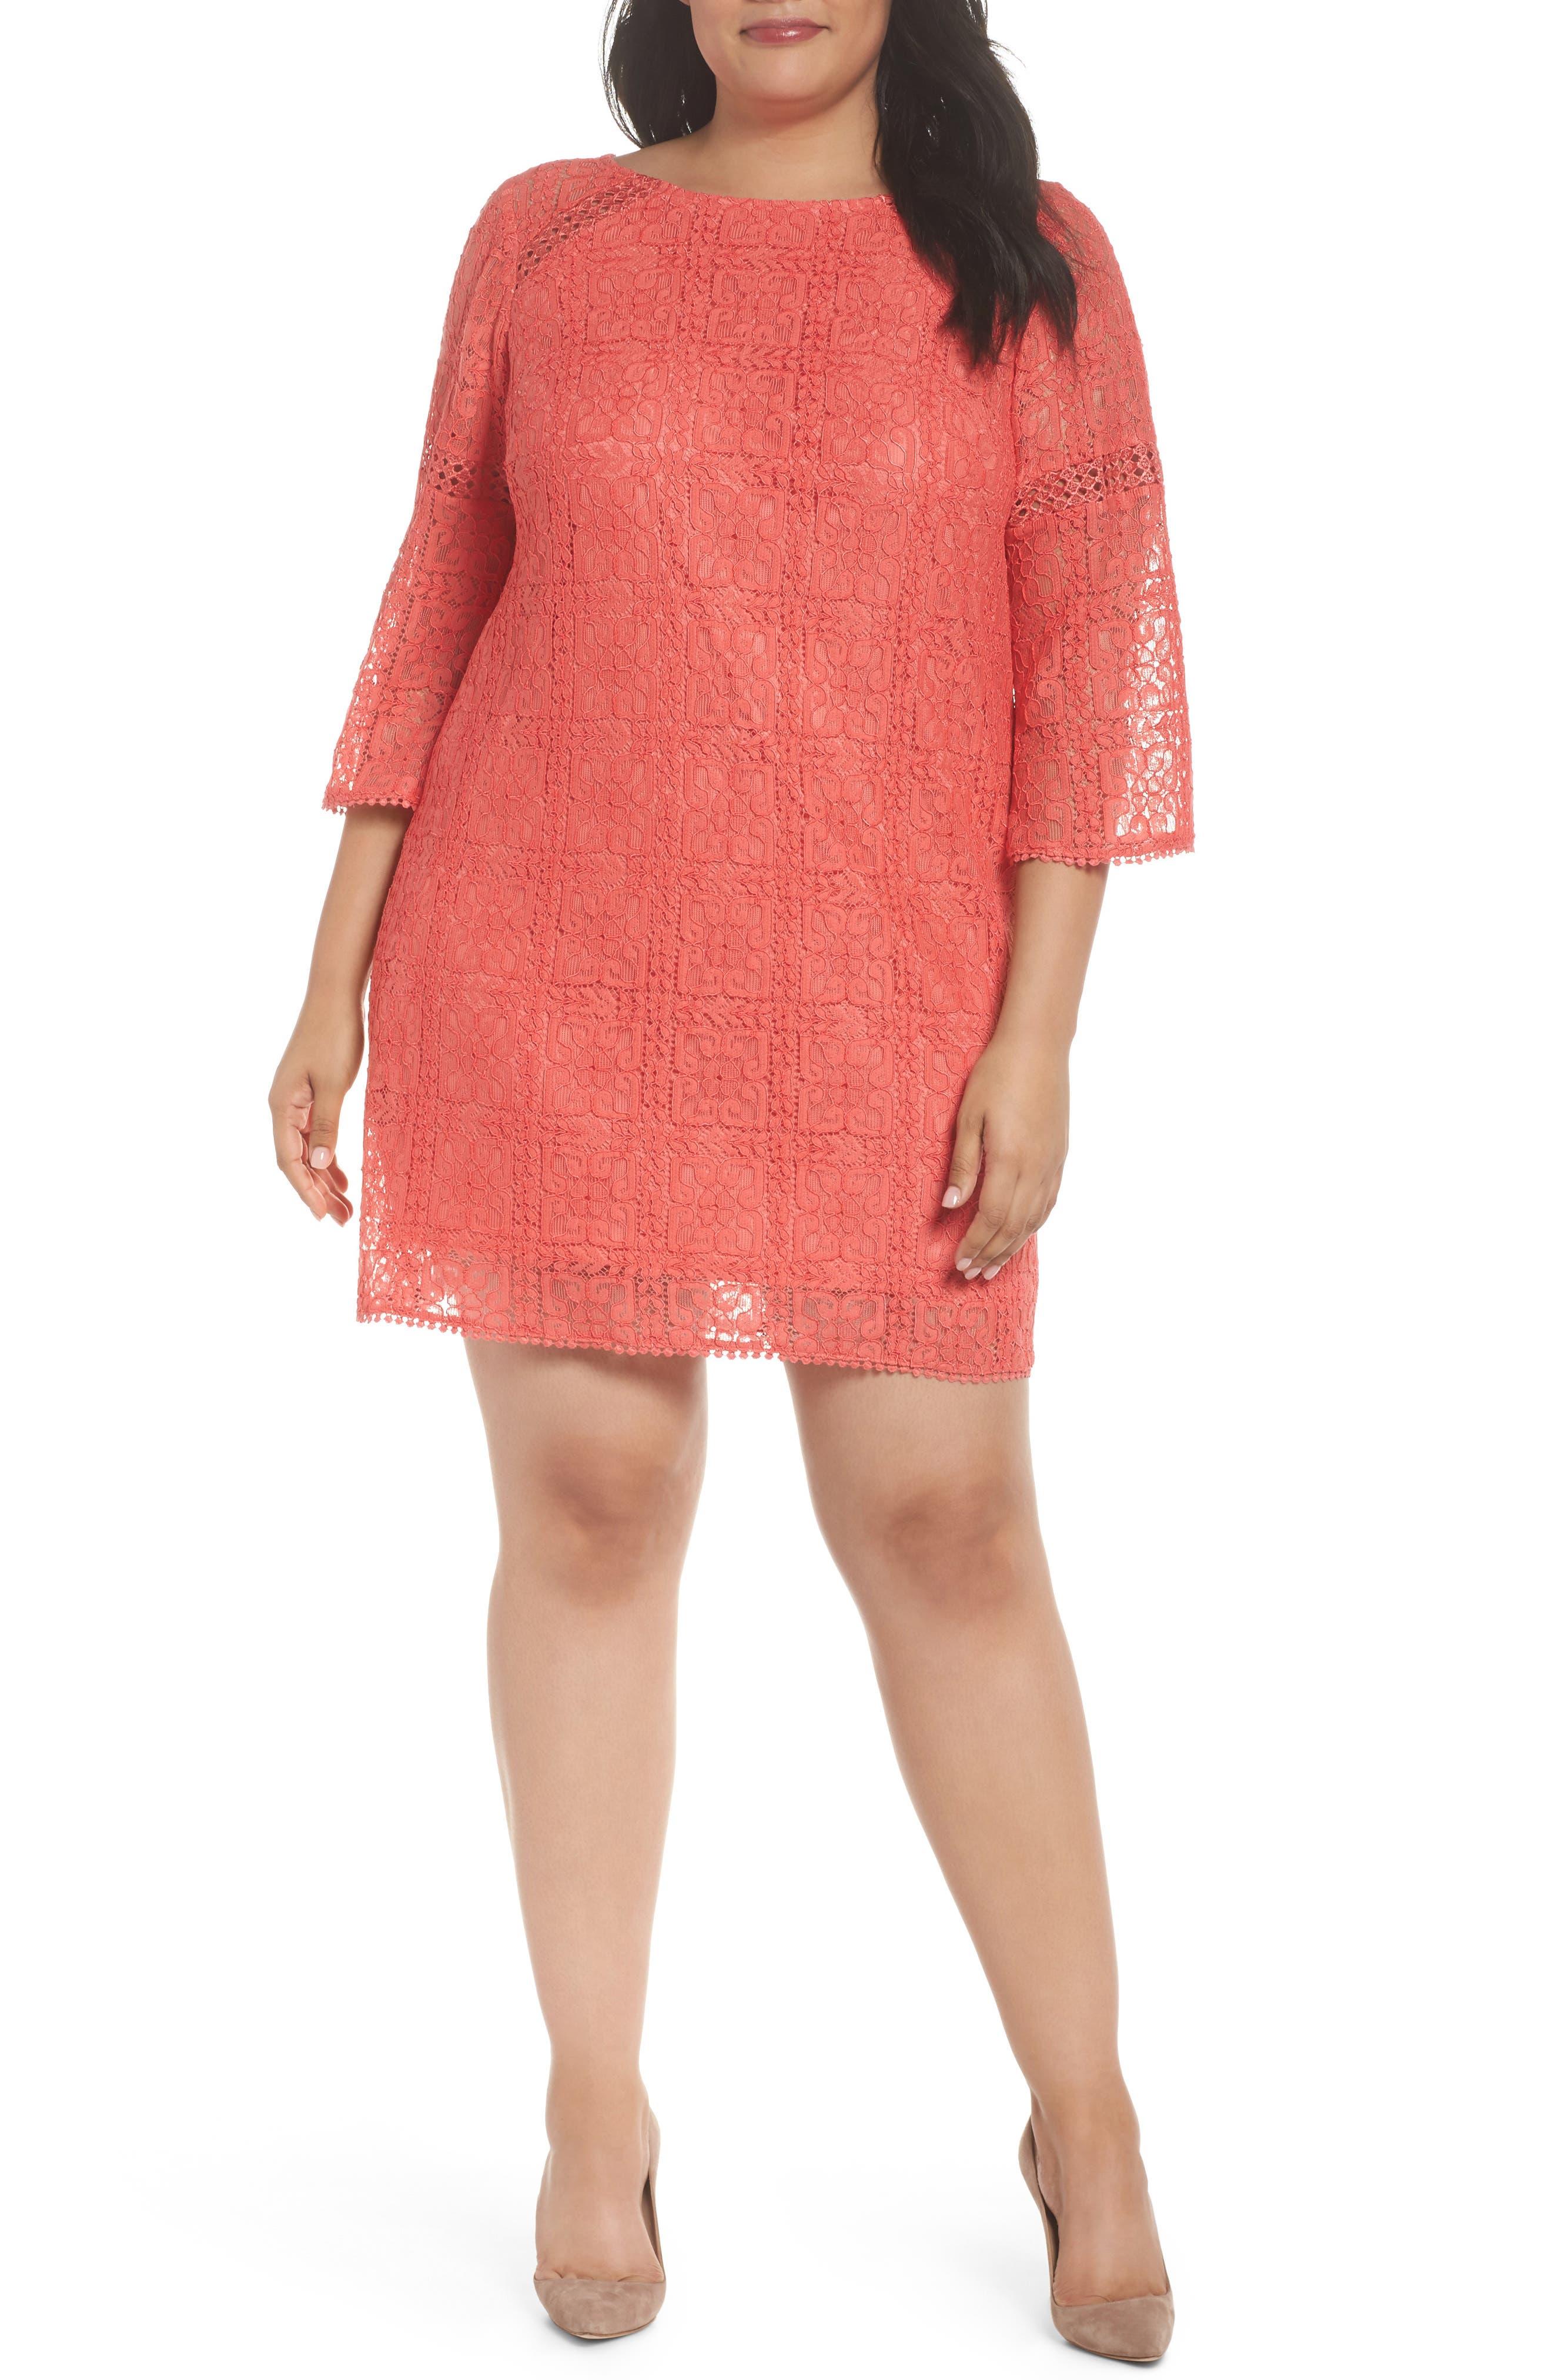 Marni Lace Shift Dress,                         Main,                         color, Cruise Coral